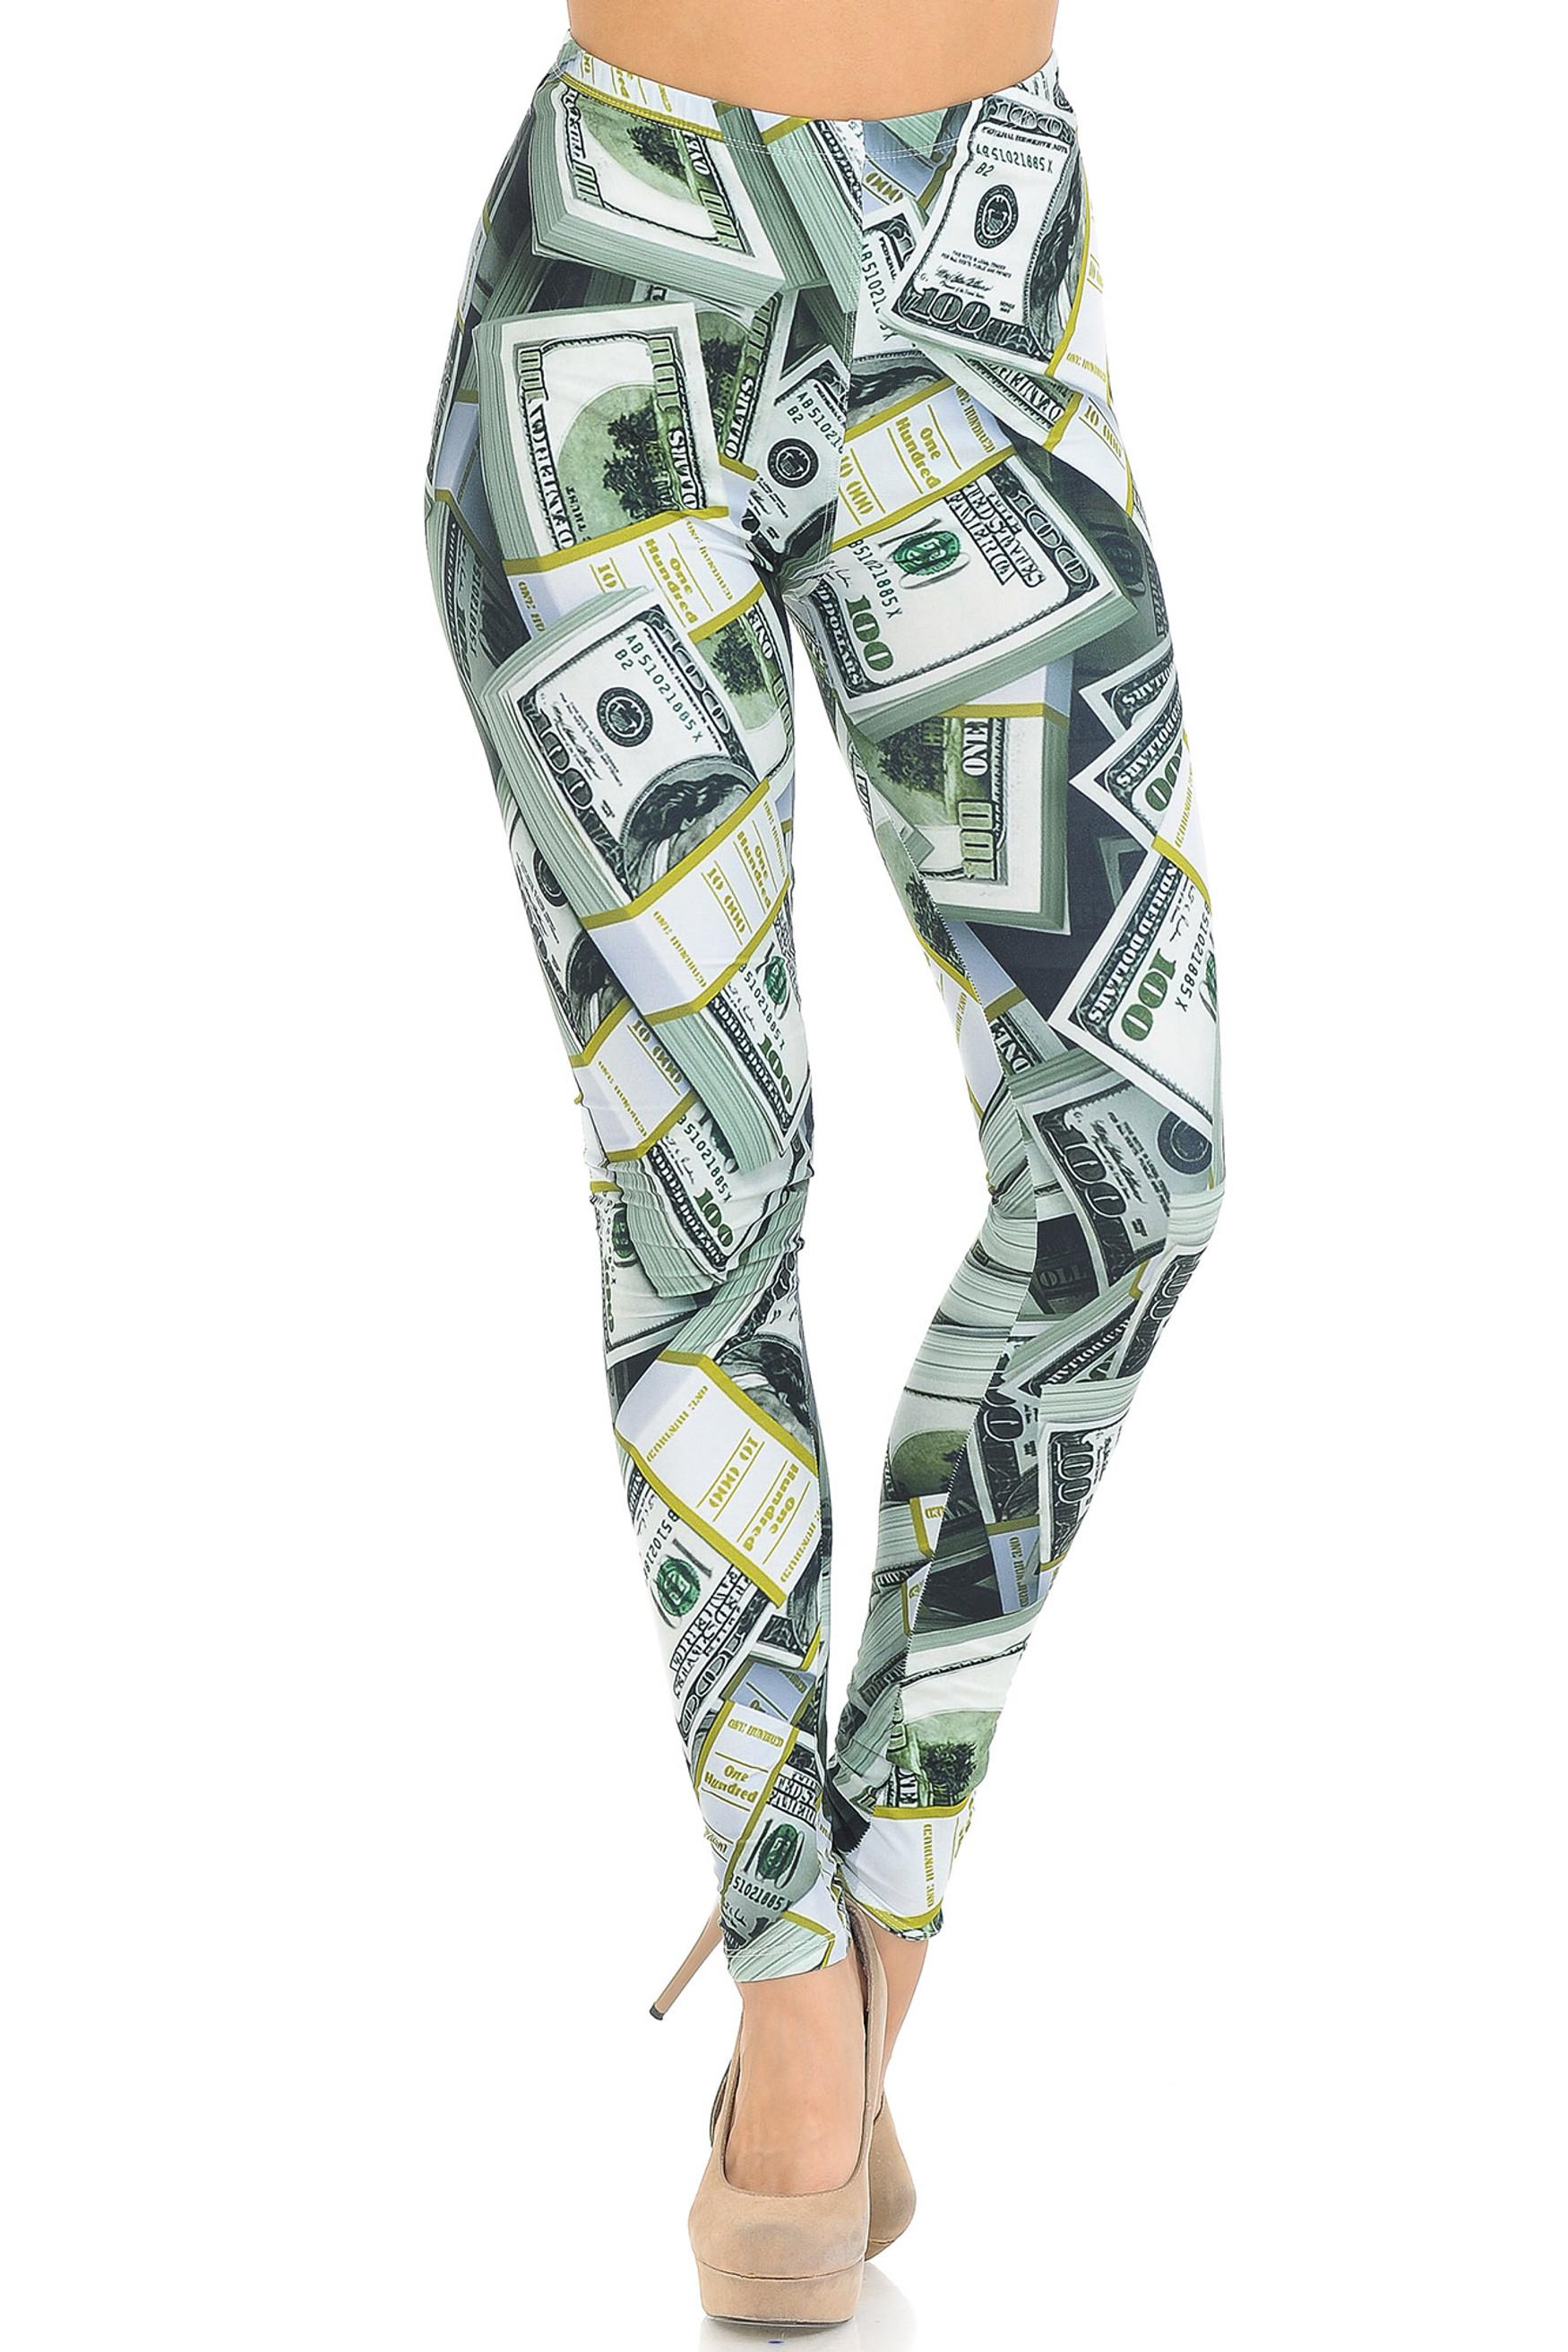 Creamy Soft Cash Money Extra Small Leggings - USA Fashion™